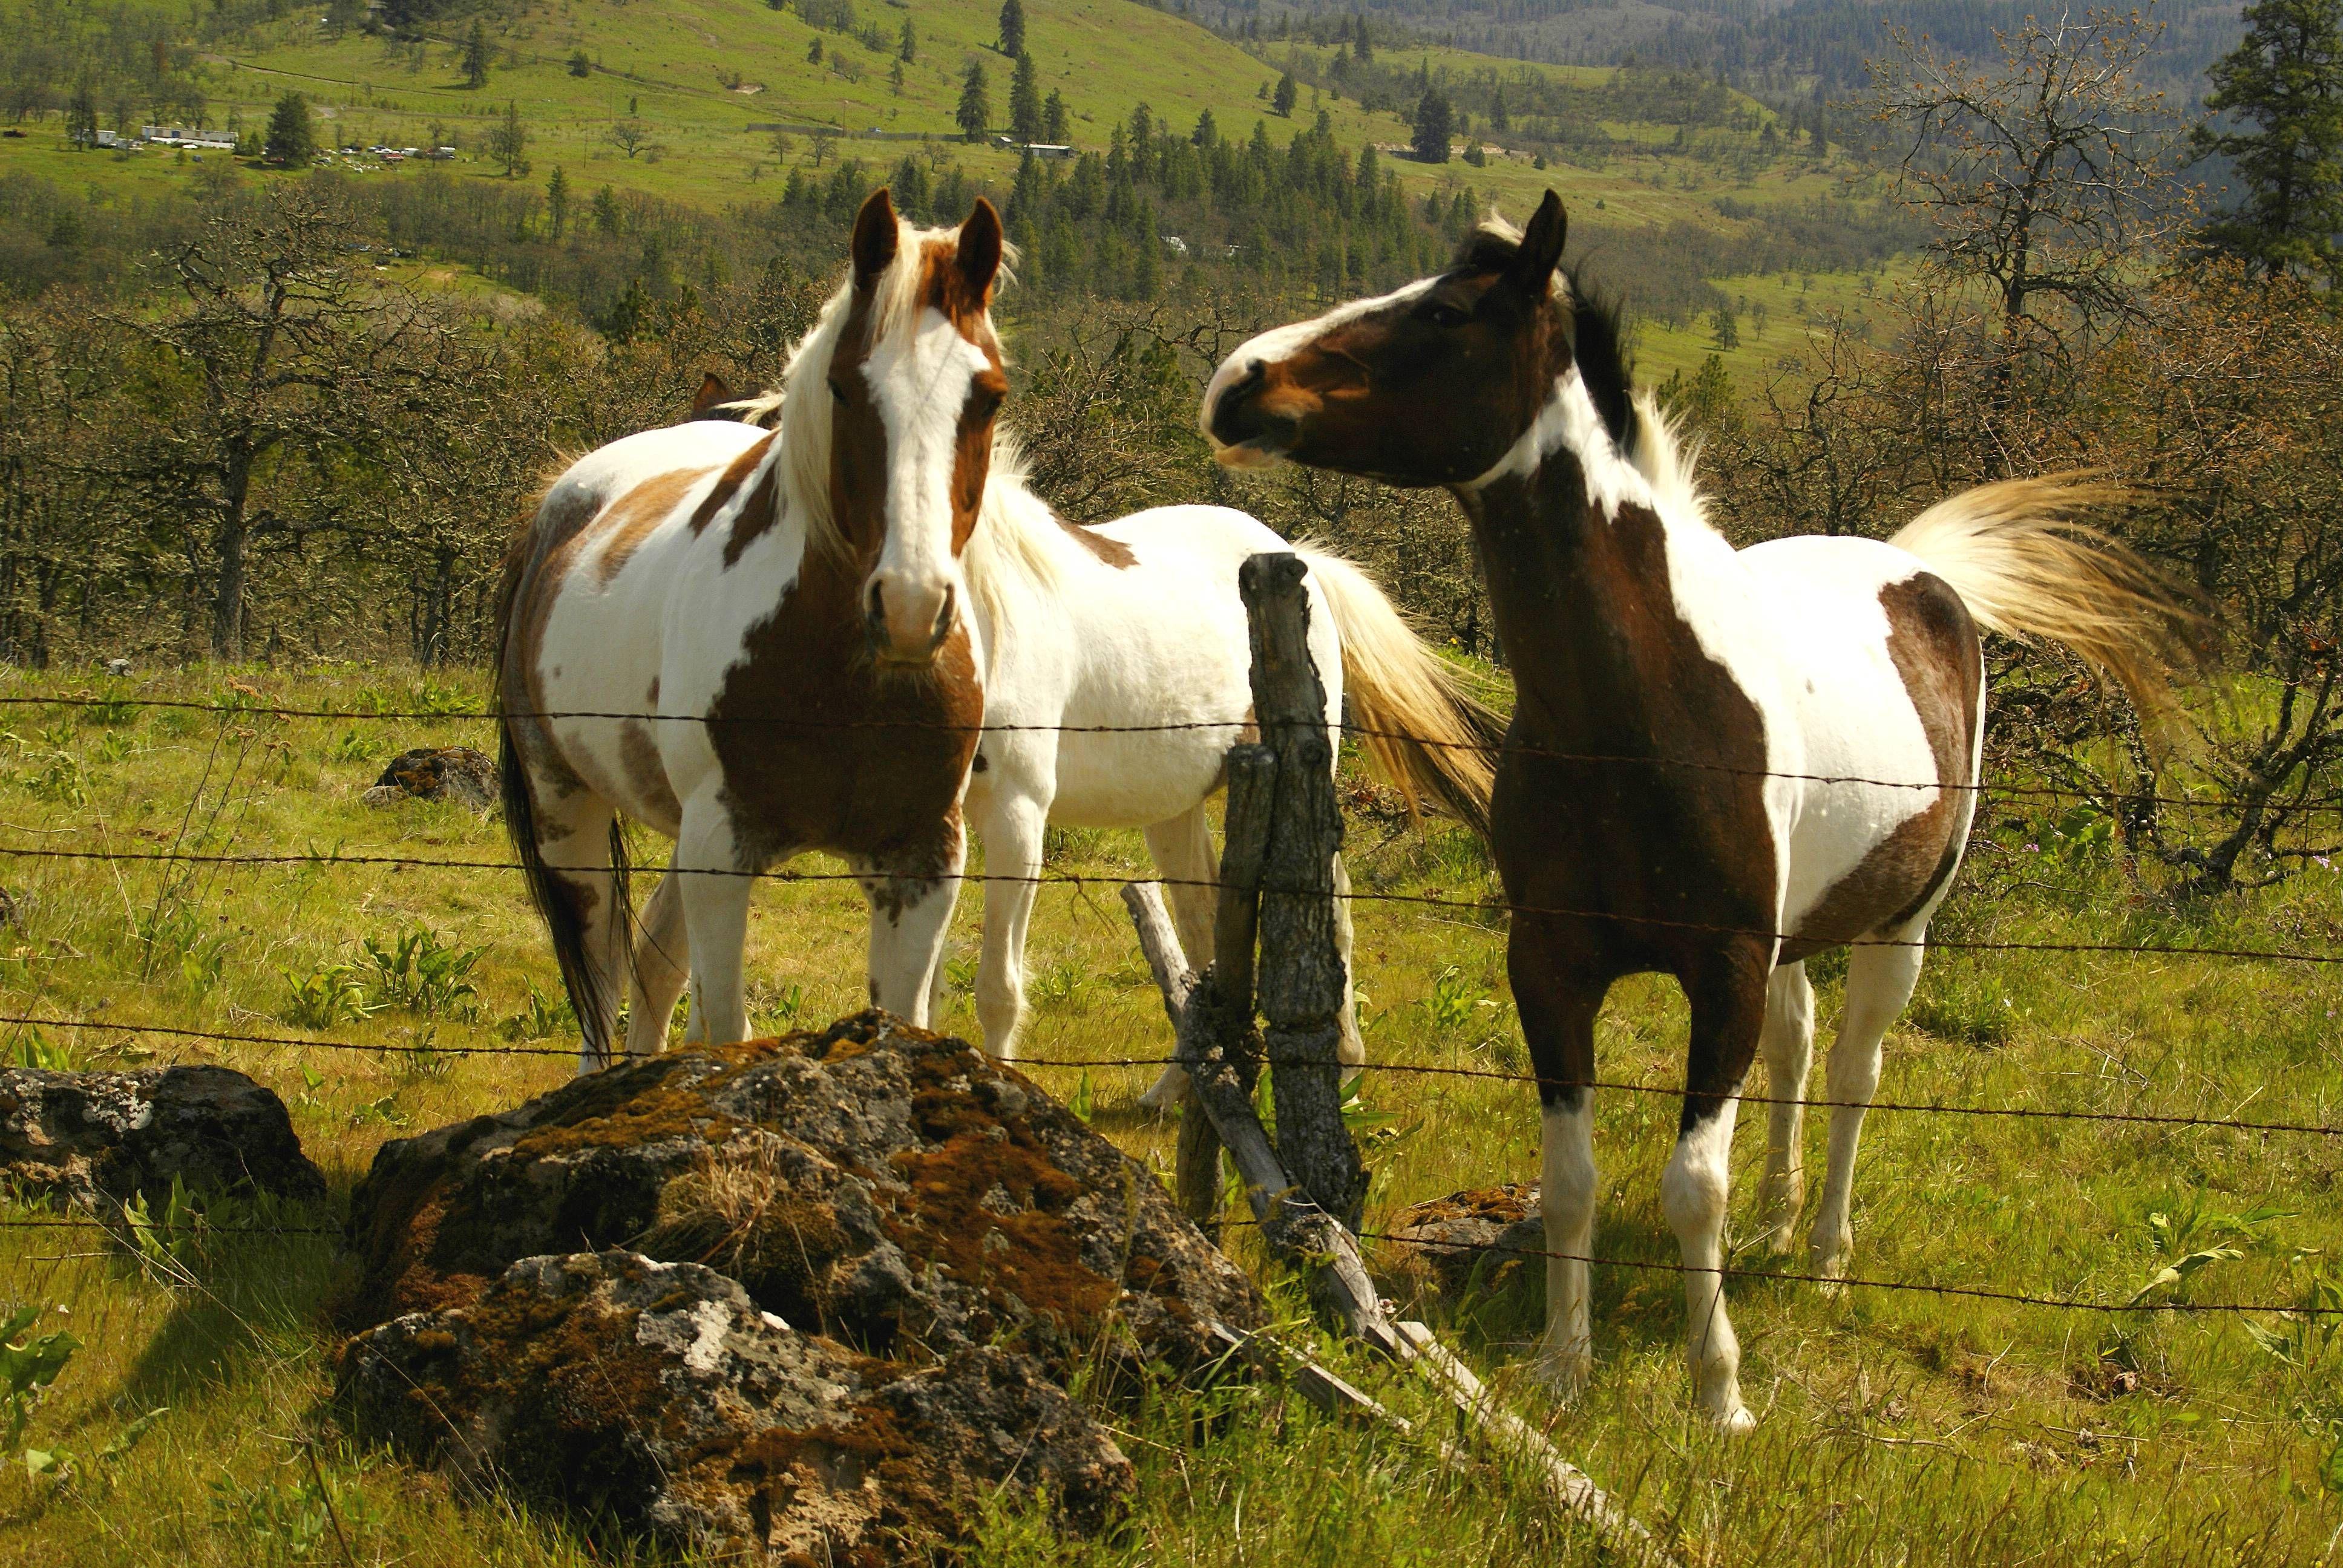 calico horse - Google Search